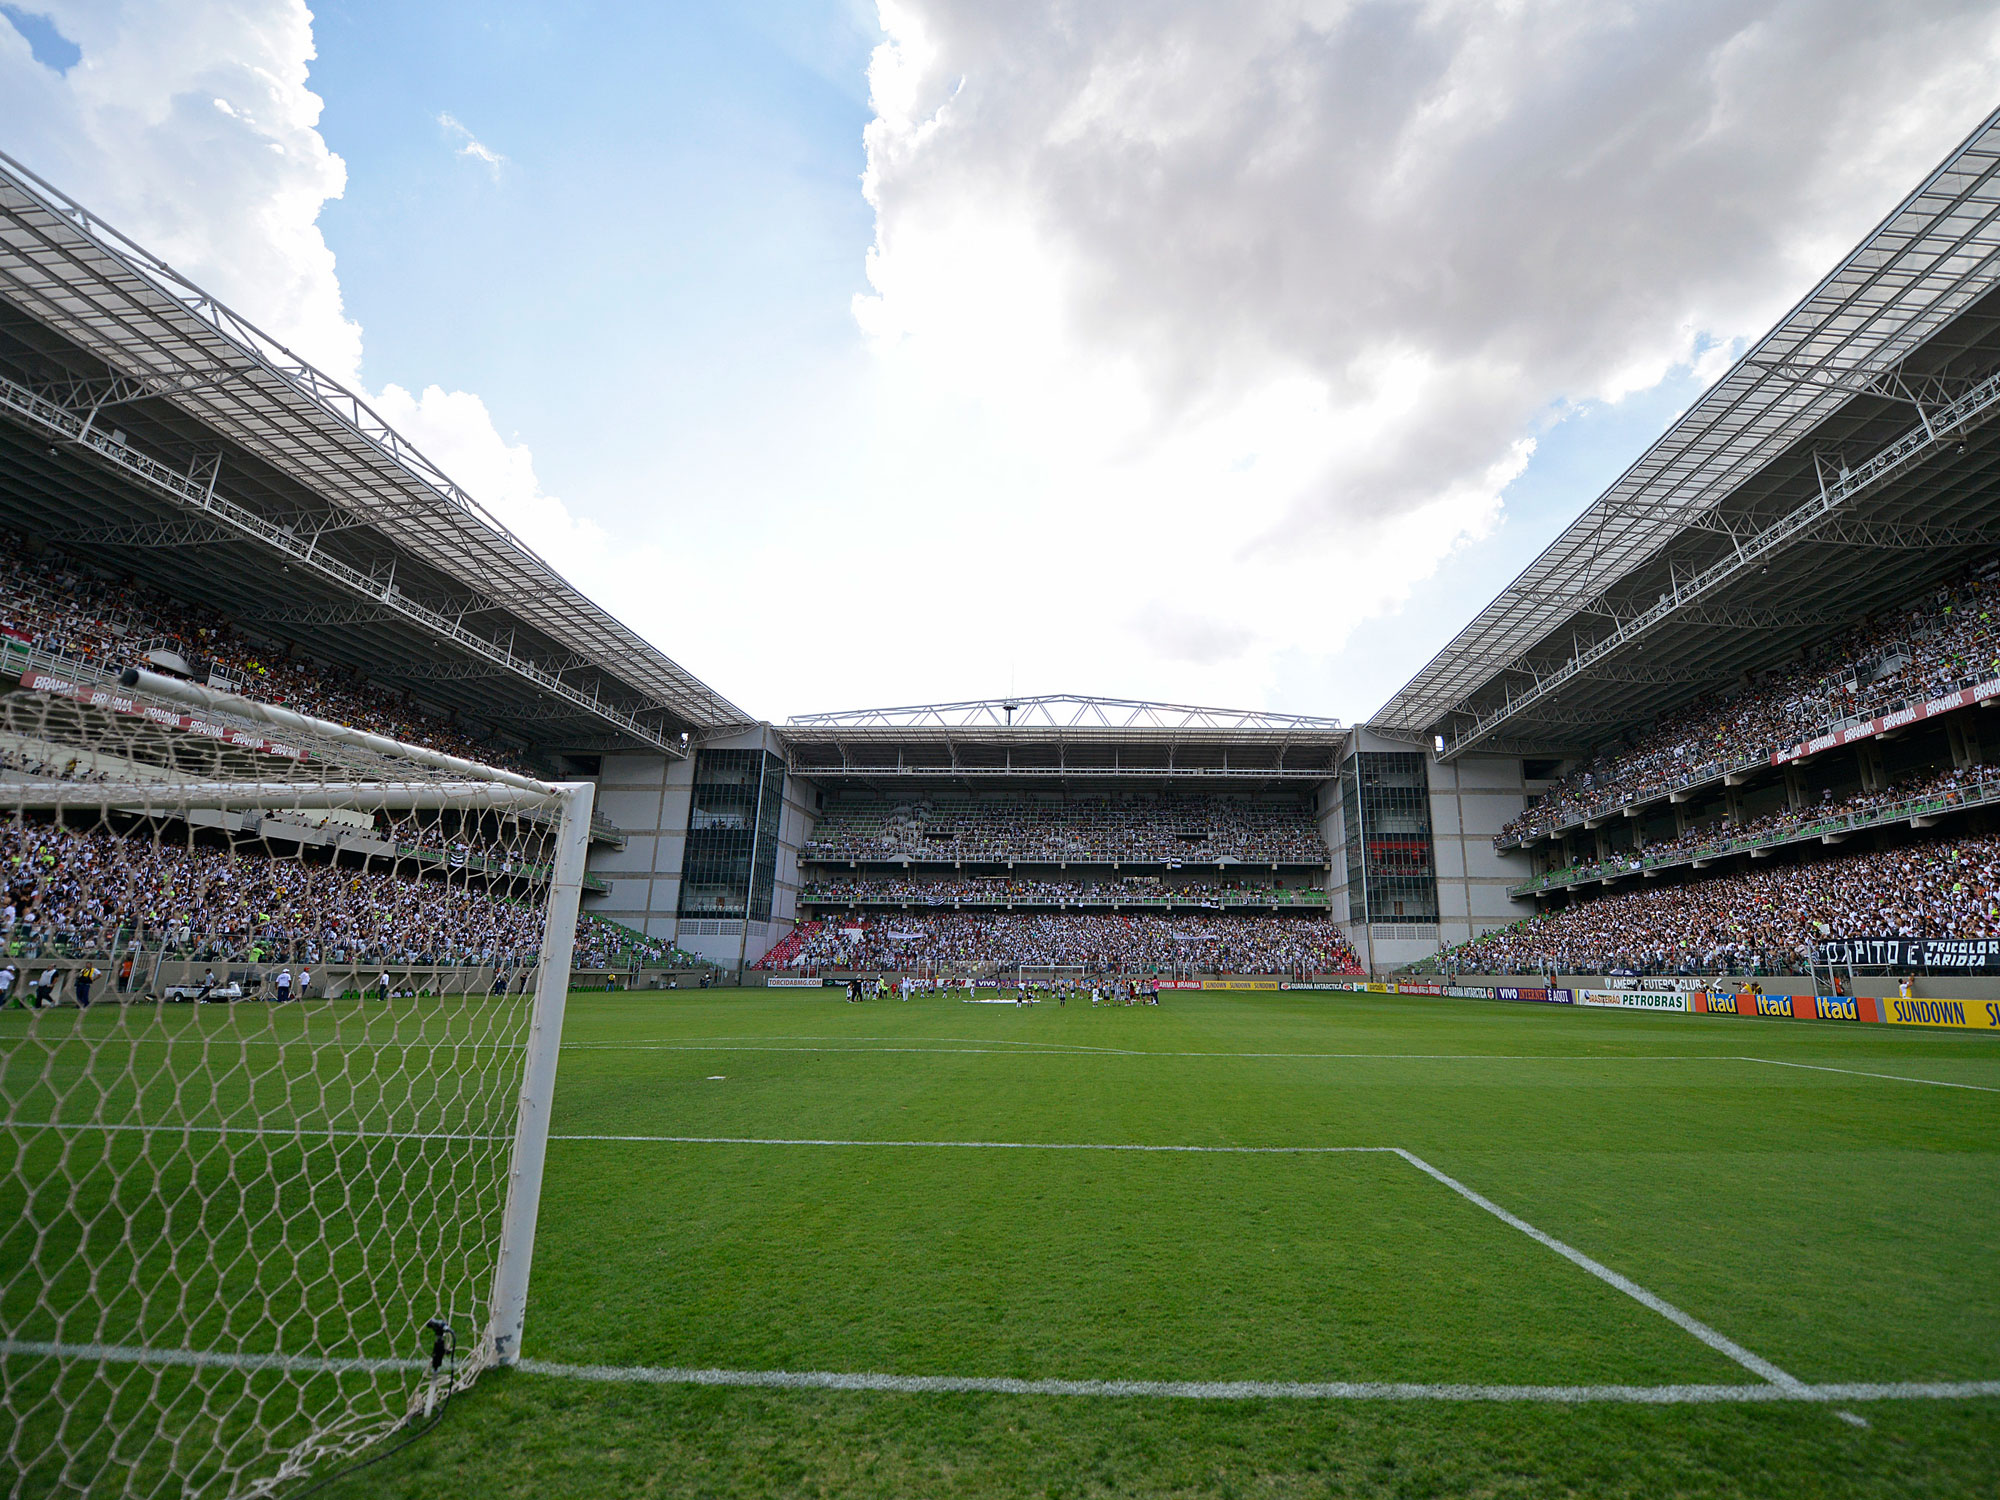 Estadio Independencia in Belo Horizonte, Brazil